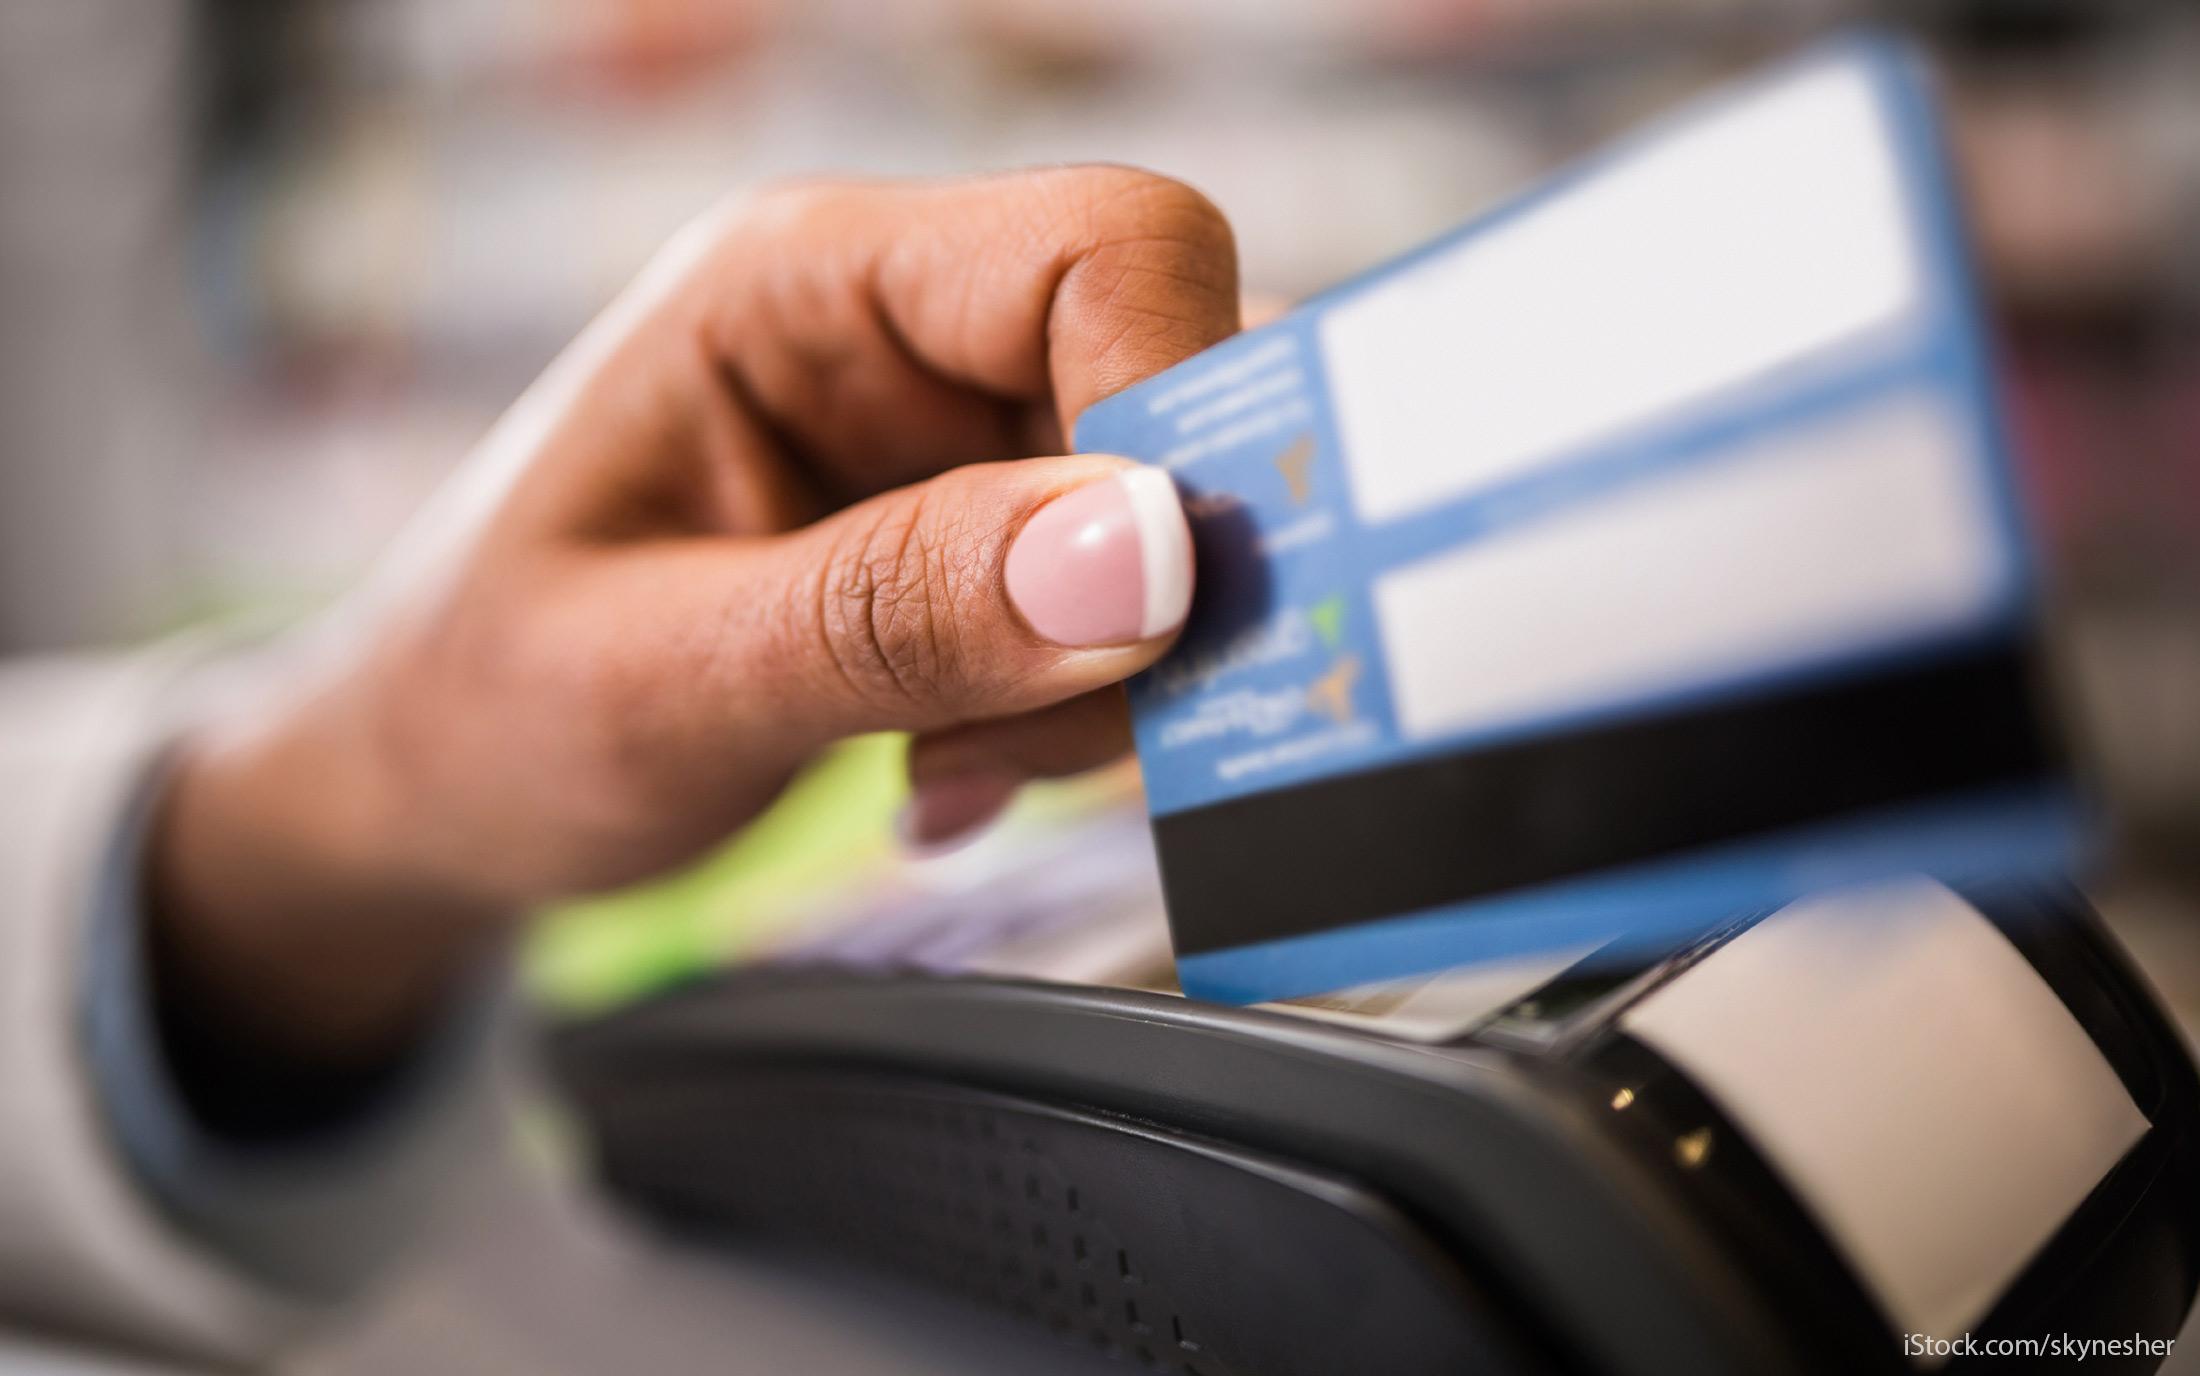 TD Bank Credit Card Review How the TD Cash Visa Credit